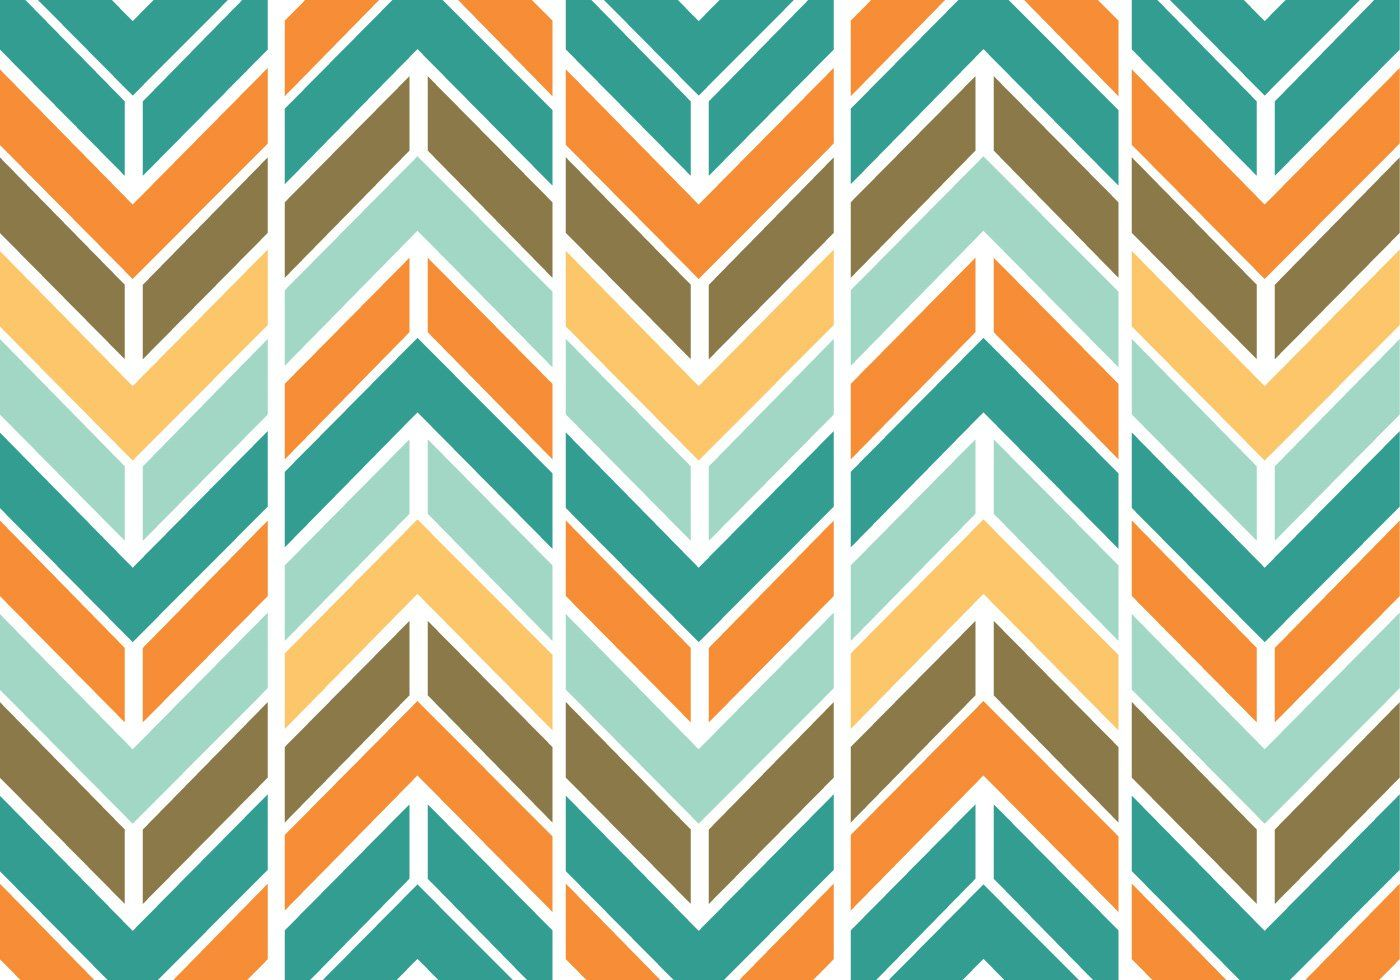 colorful-funky-chevron-pattern-vector.jpg (1400980)